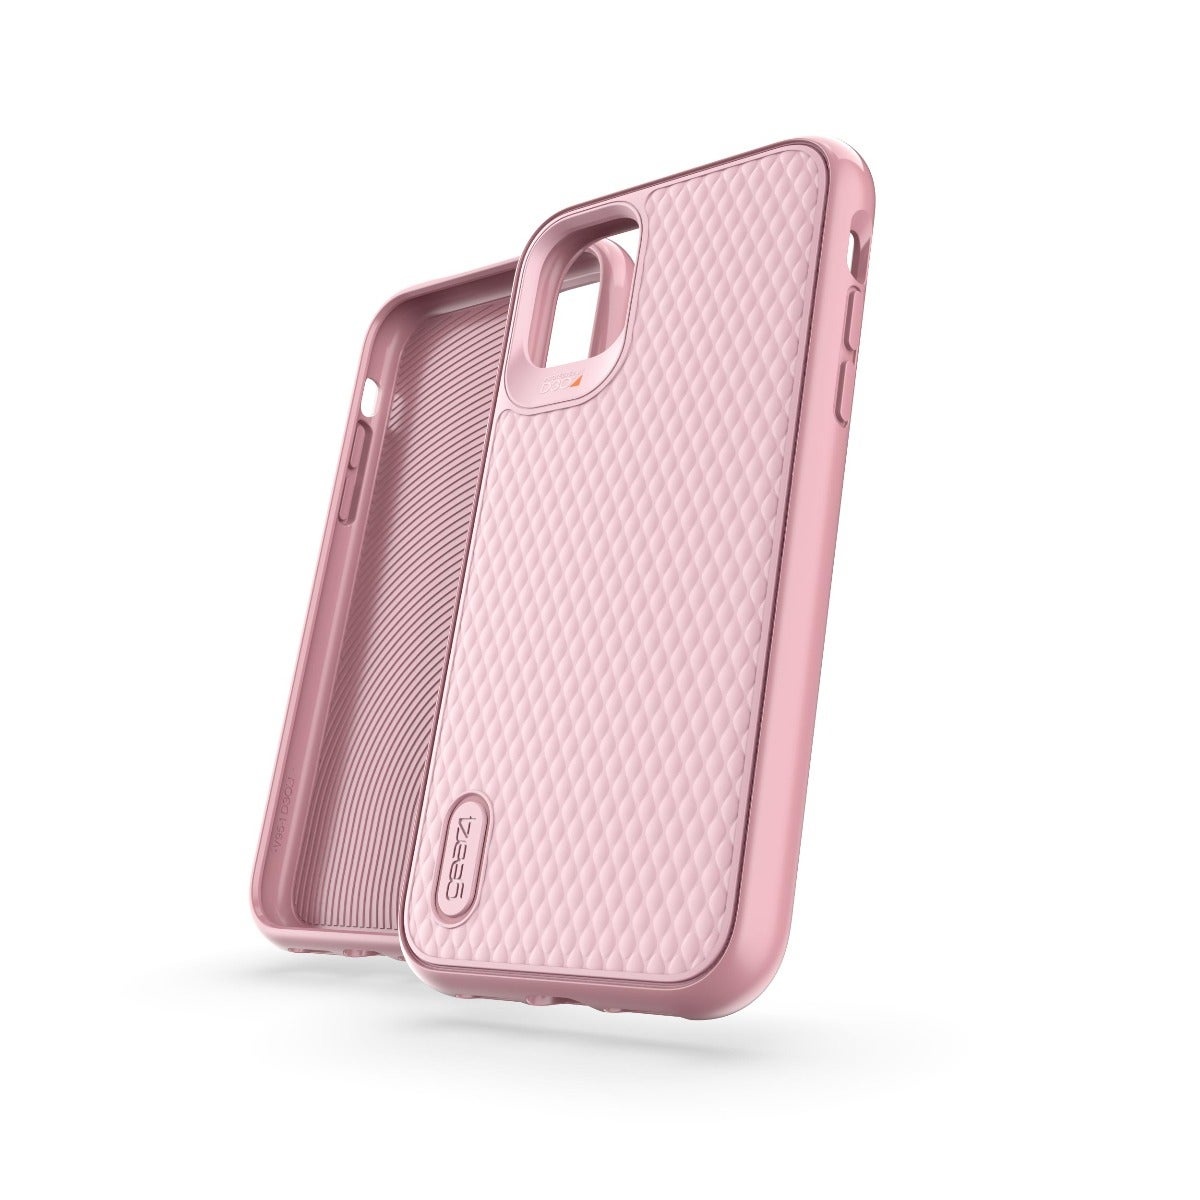 "GEAR4 Battersea funda para teléfono móvil 14,7 cm (5.8"") Rosa"